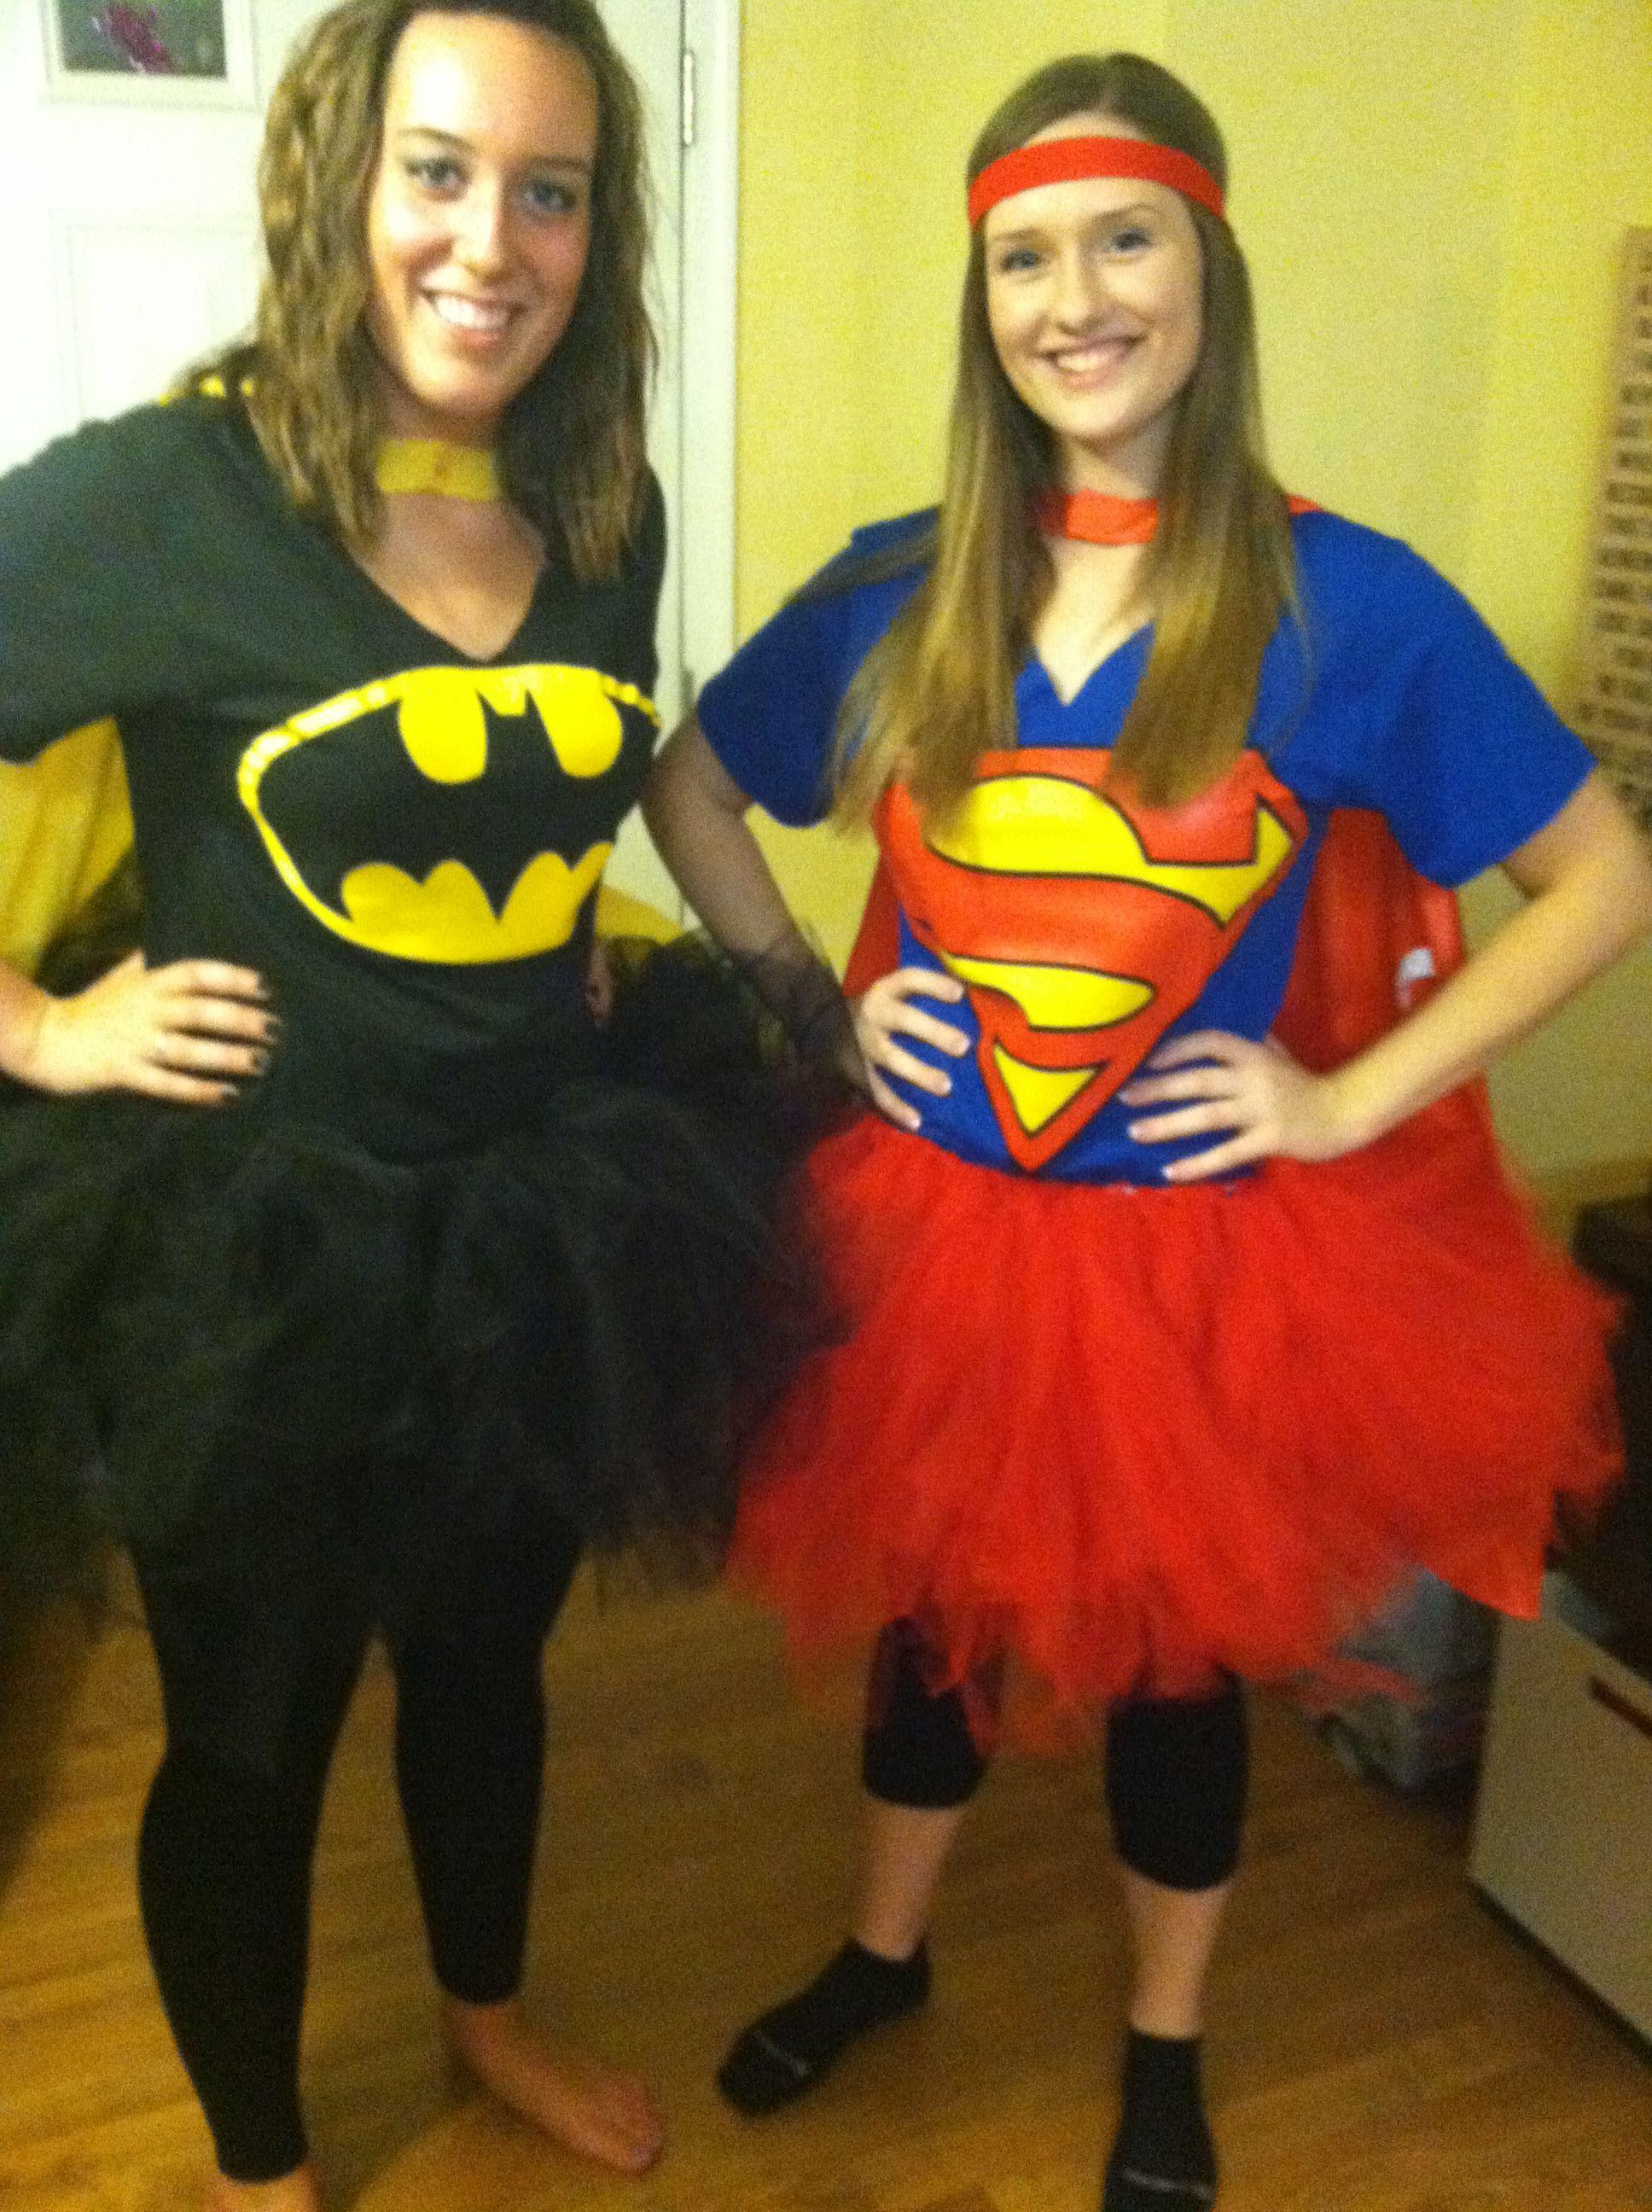 cheap costume for the supercon 5k superhero tshirts tutus and leggings  sc 1 st  Pinterest & cheap costume for the supercon 5k: superhero tshirts tutus and ...